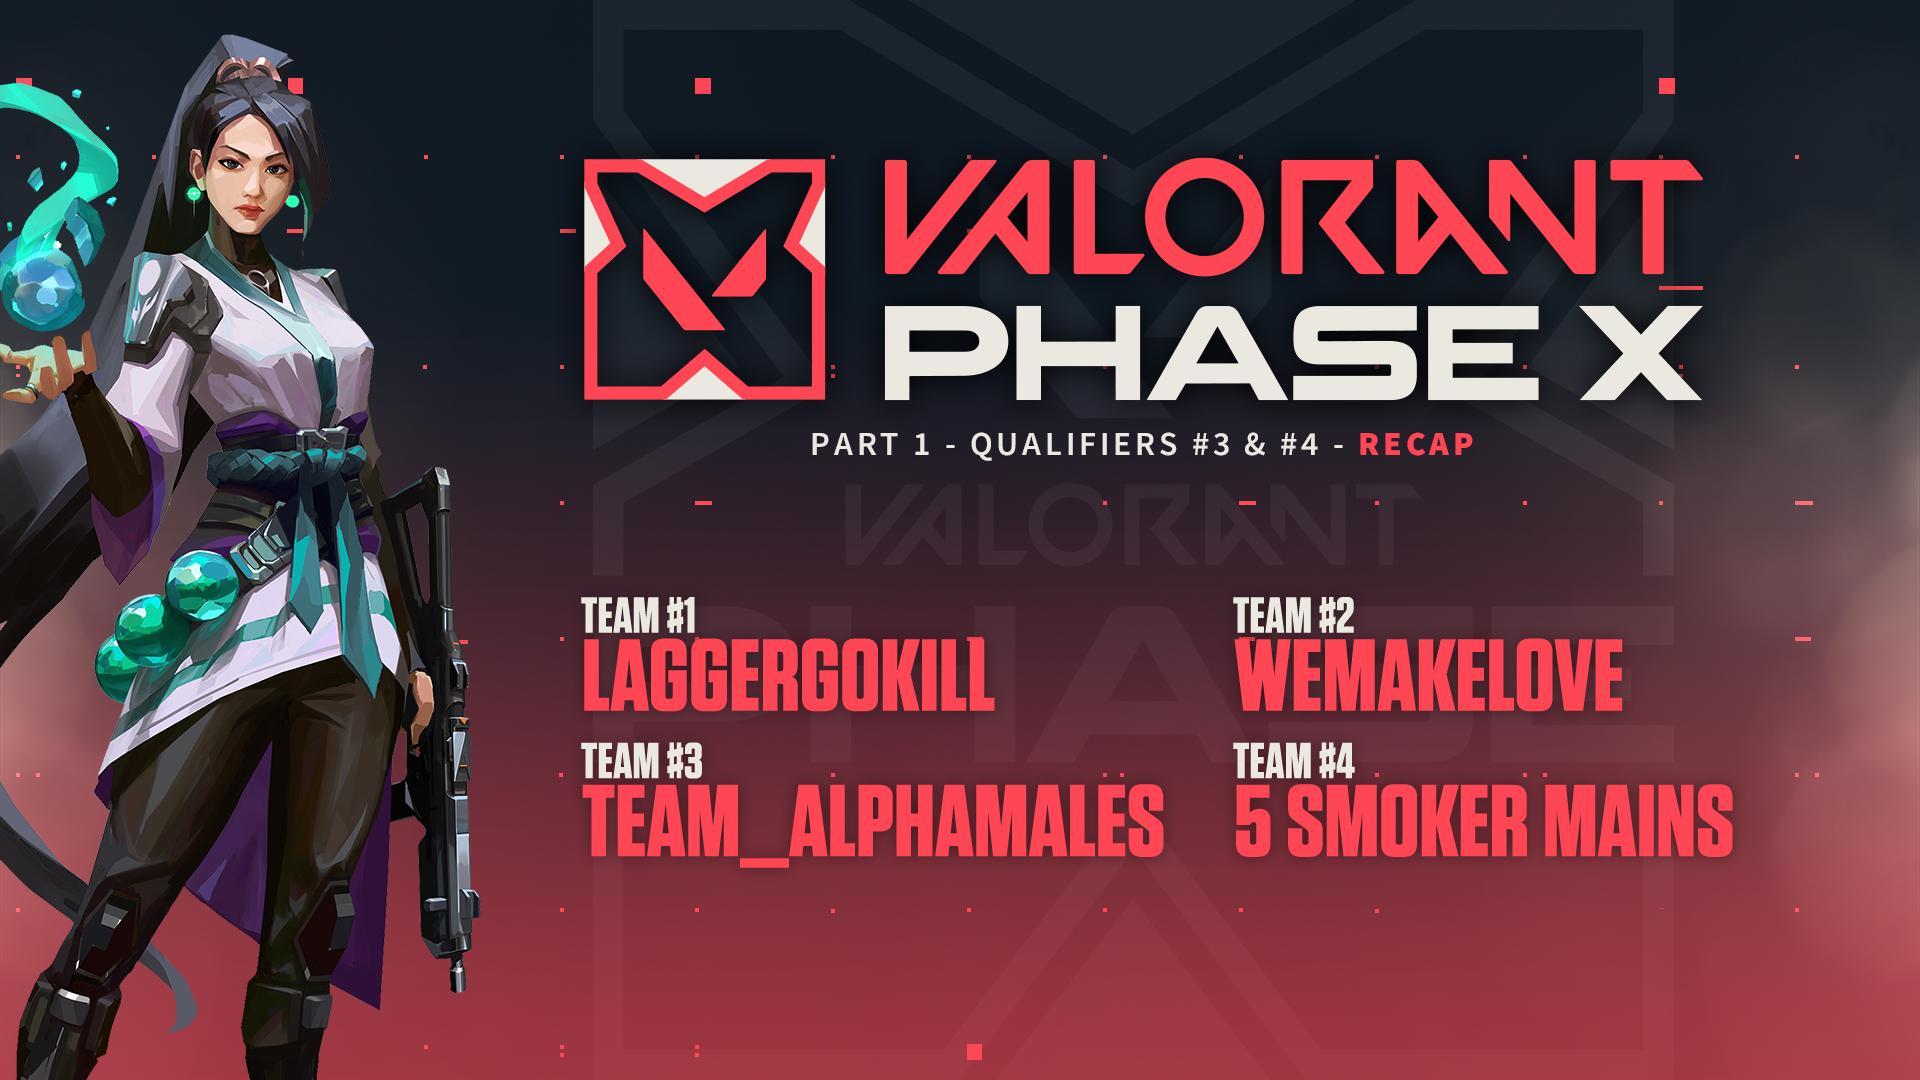 VALORANT LEGENDS Phase X Part #1 – Qualifiers #3-4 Recap